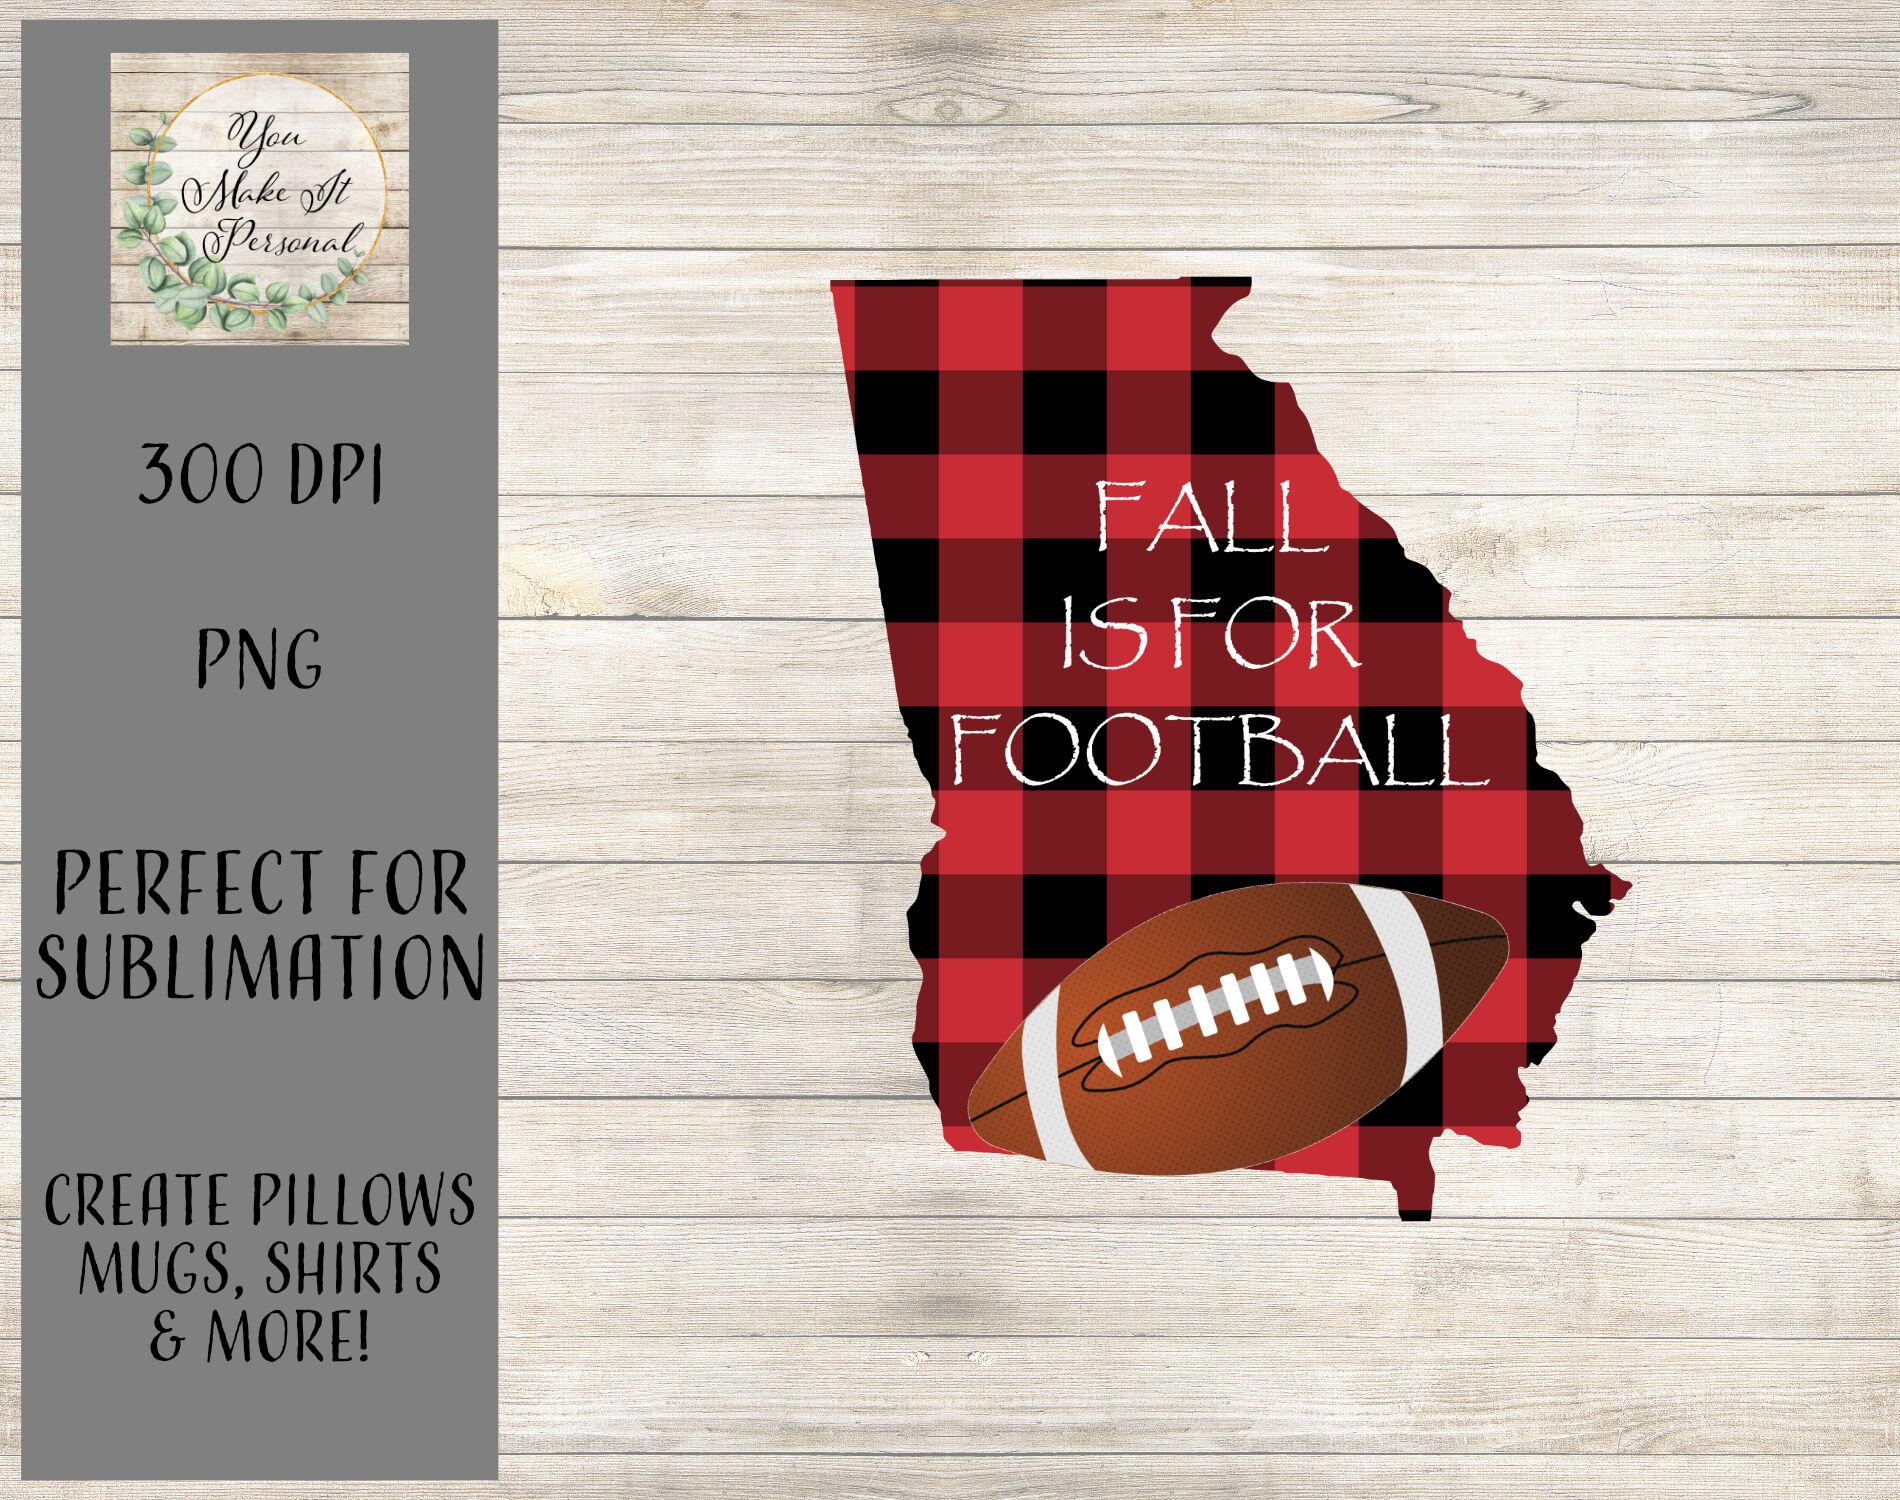 Fall Is For Football - Georgia Football Design - Sublimation